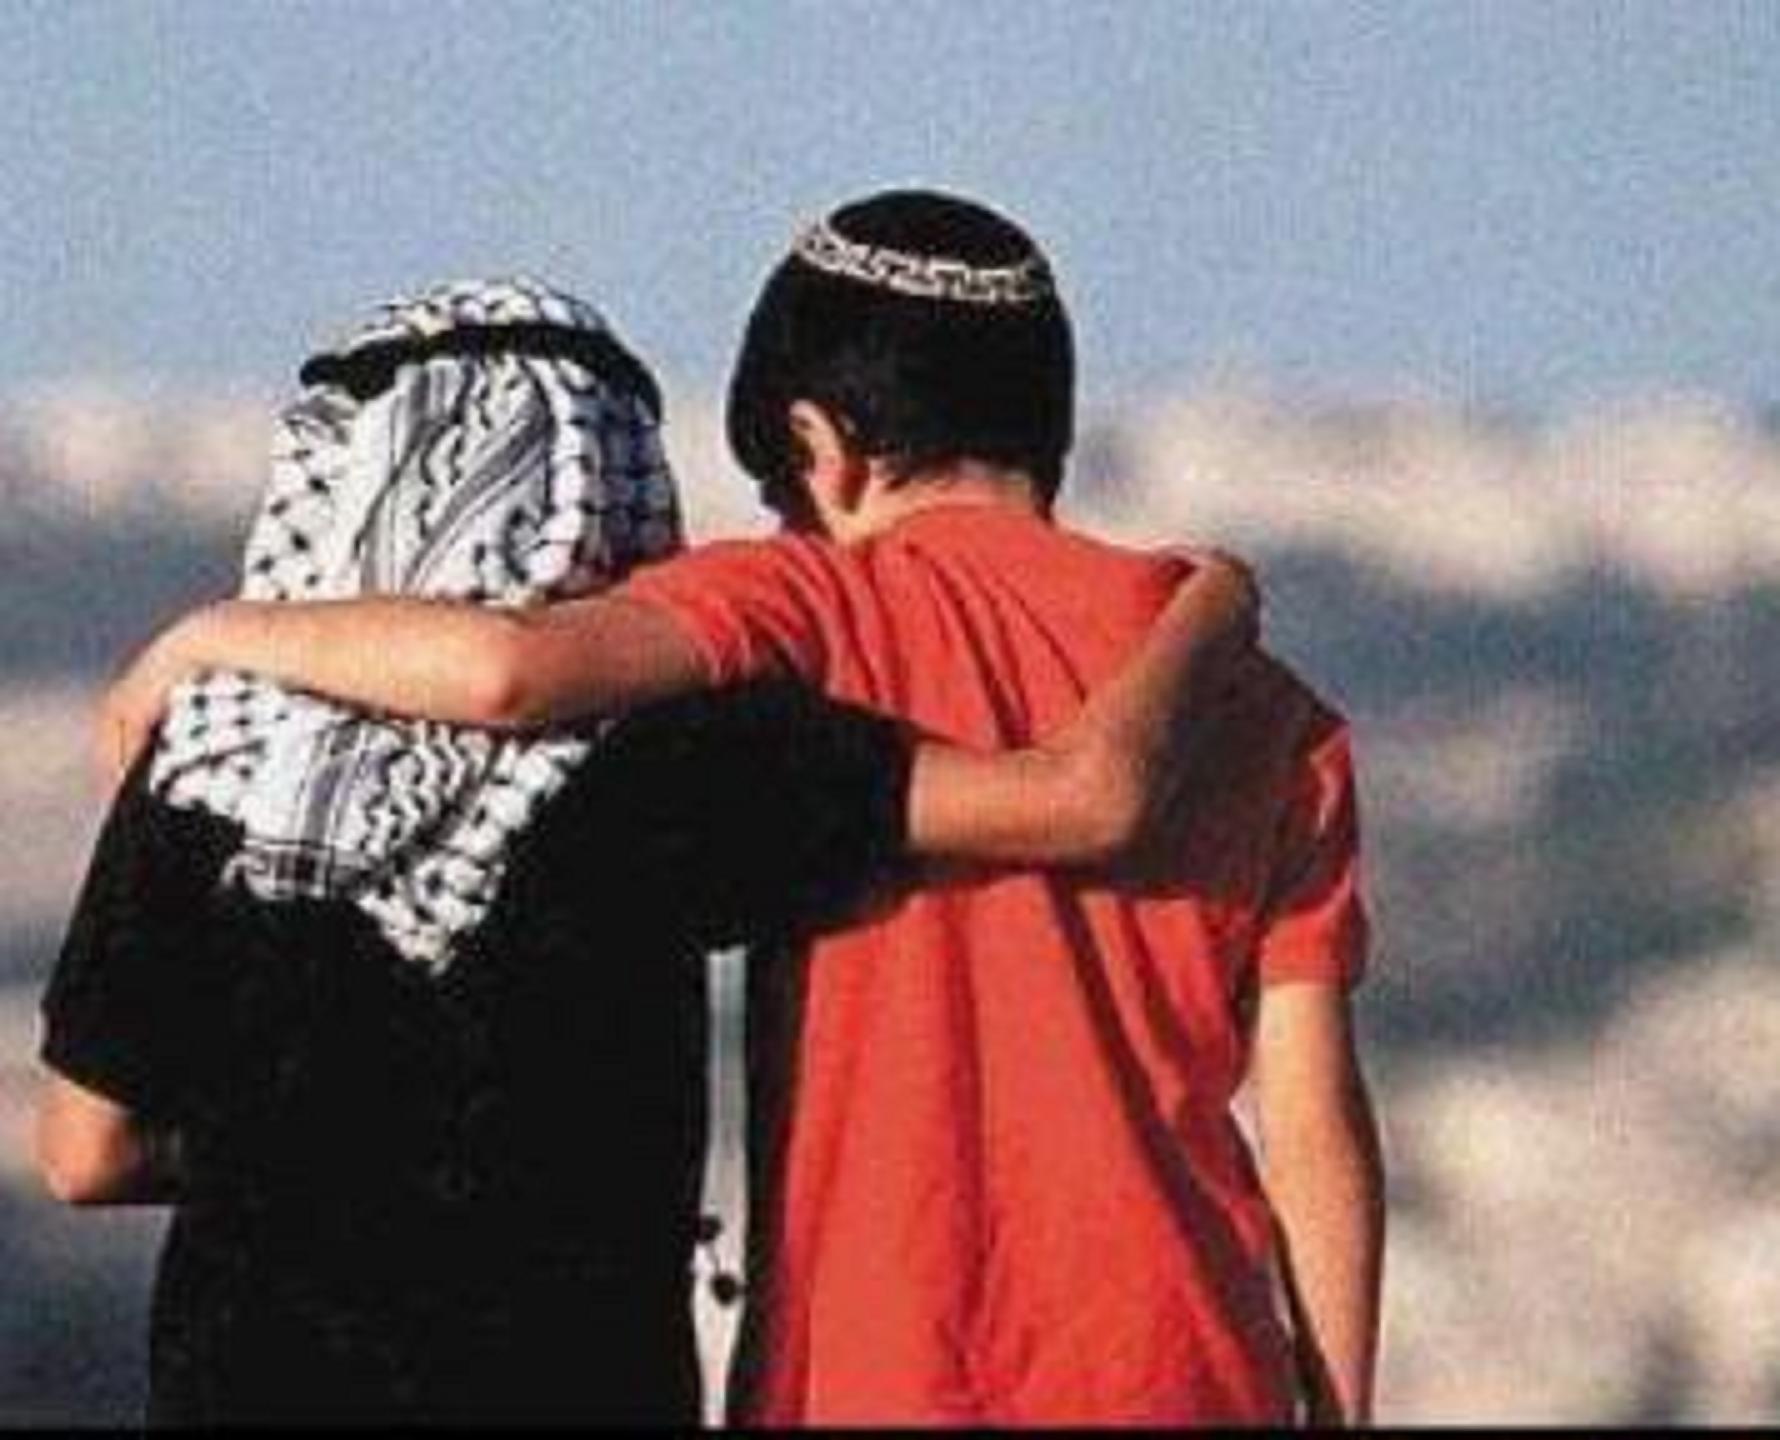 http://www.youthunitedpress.com/risoluzione-onu-palestina-stato-osservatore/